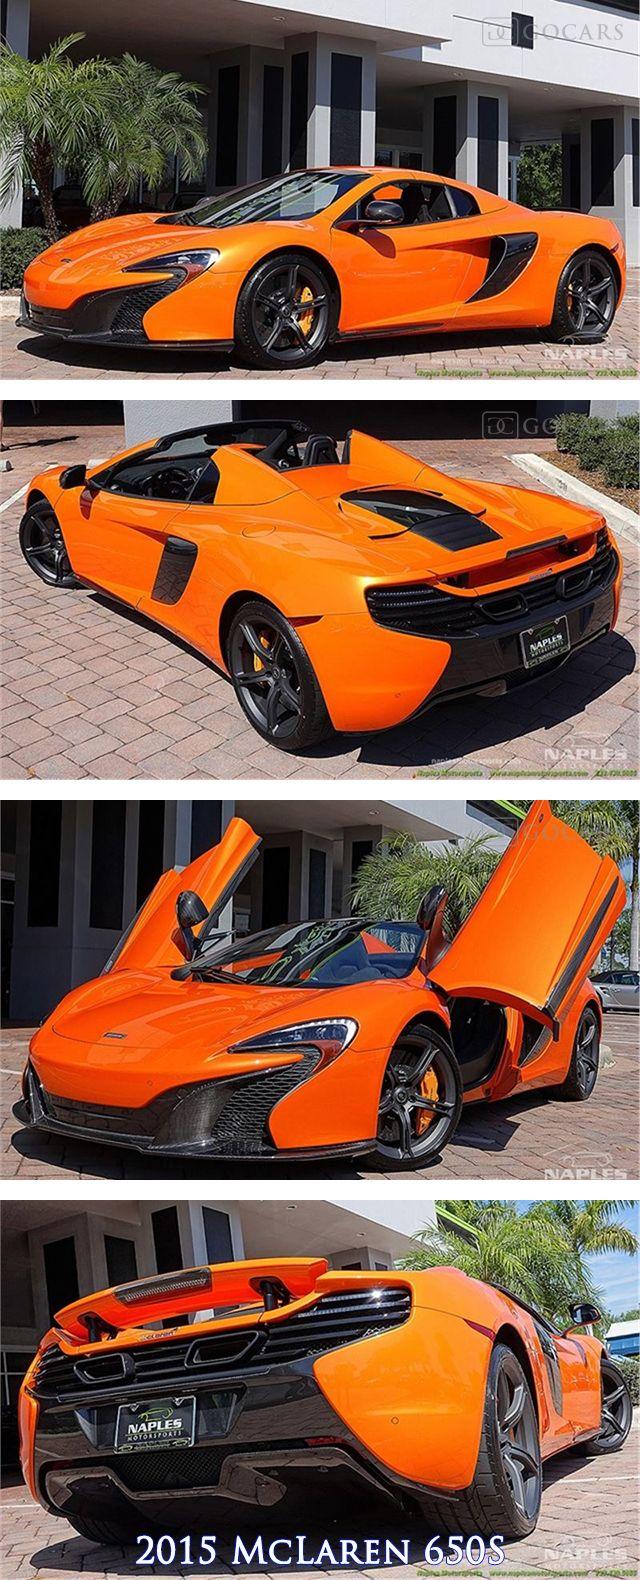 2015 McLaren 650S, Tarocco Orange Exterior, Black Alcantara Interior, 3.8L V8 Twin Turbo 641hp @ 7000rpm 500lb-ft @ 3000rpm, 7 Speed Dual Clutch Transmission. #mclaren #650s #mclaren650s #supercar #supercars #sportscar #sportscars #mclarenphotos #luxury #luxurycars #gocars